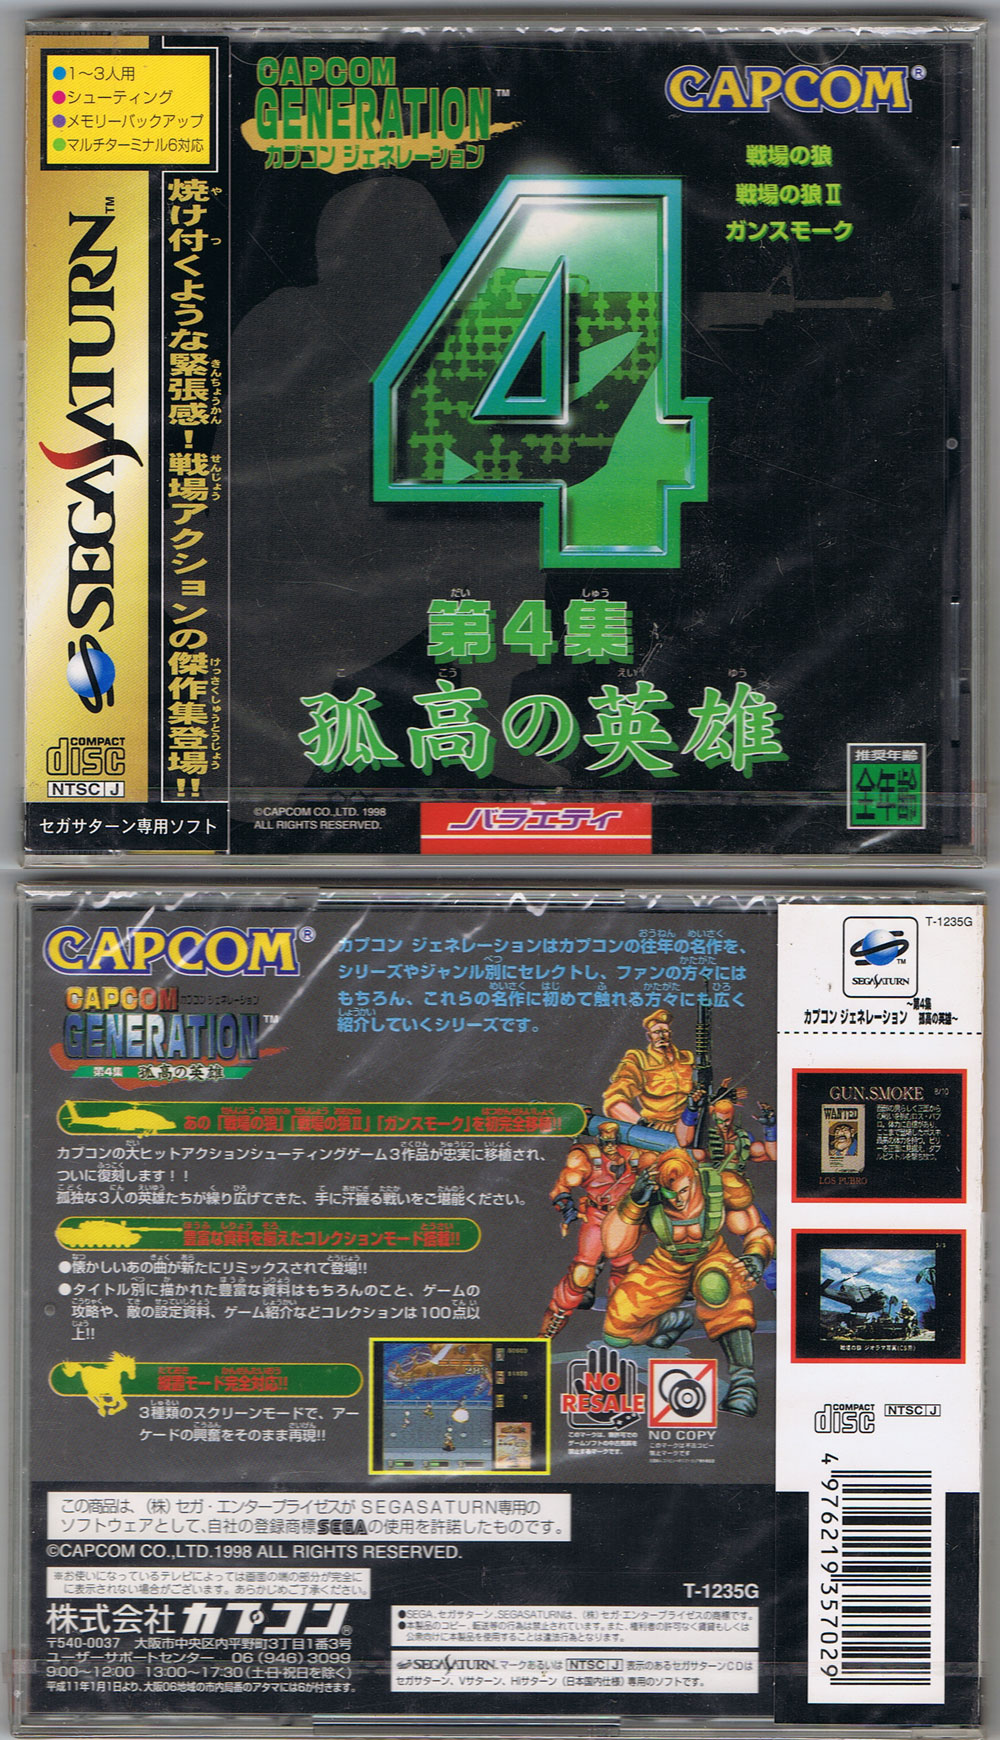 Capcom Generation 4 (New) from Capcom - Sega Saturn